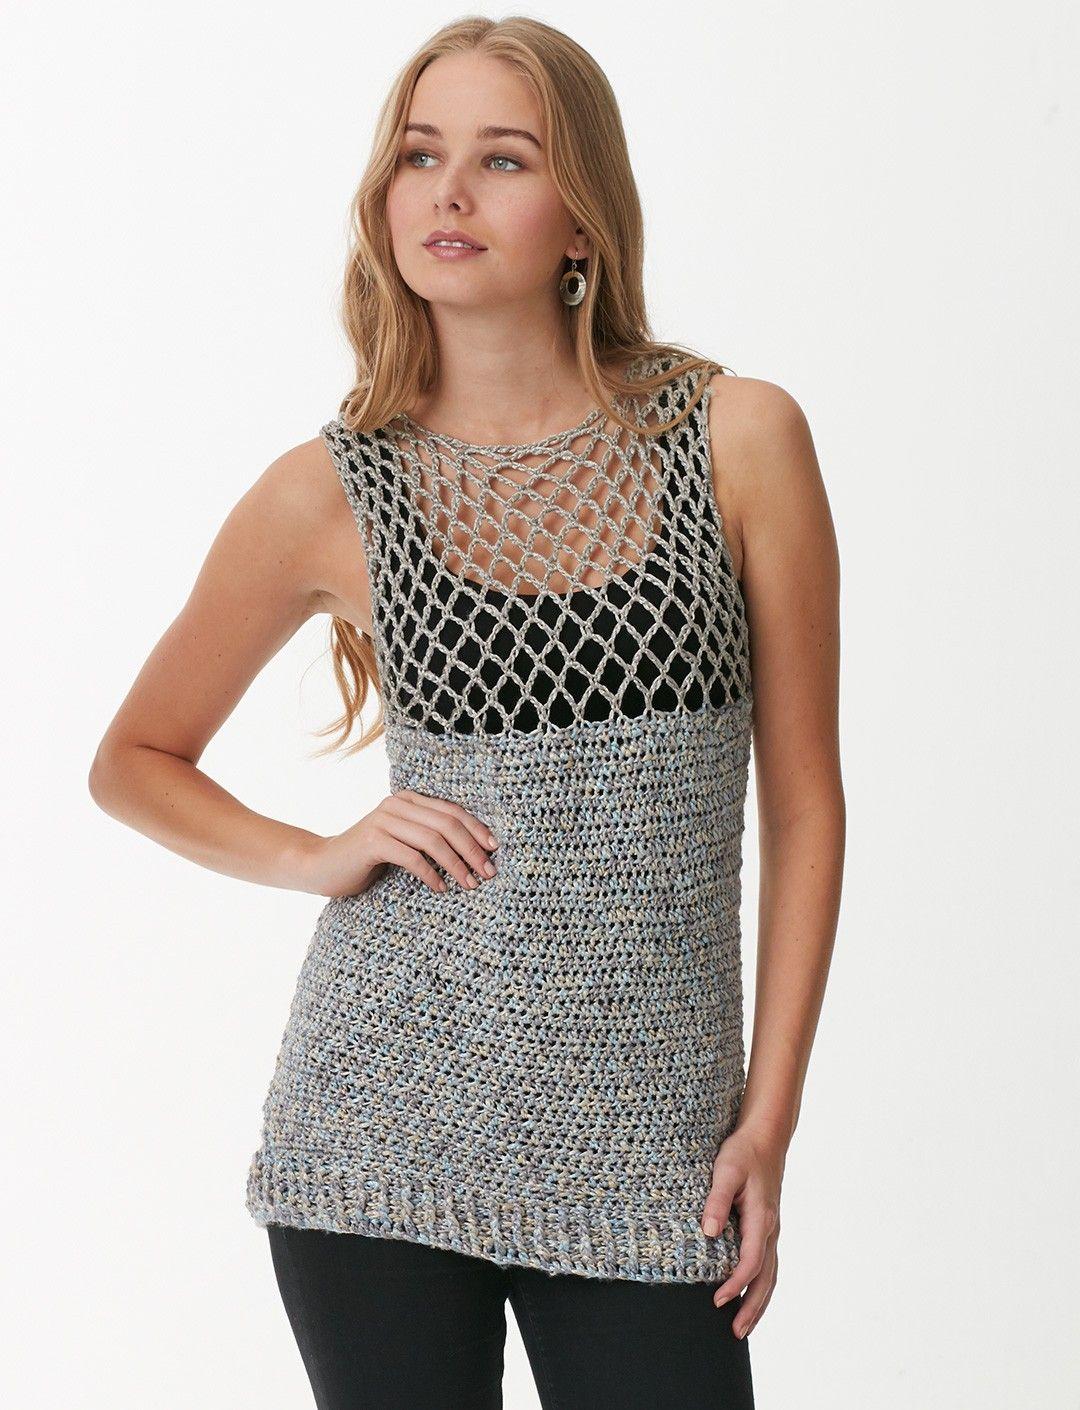 Mesh top (pattern) on Yarnspirations.com | crocheting and knitting ...